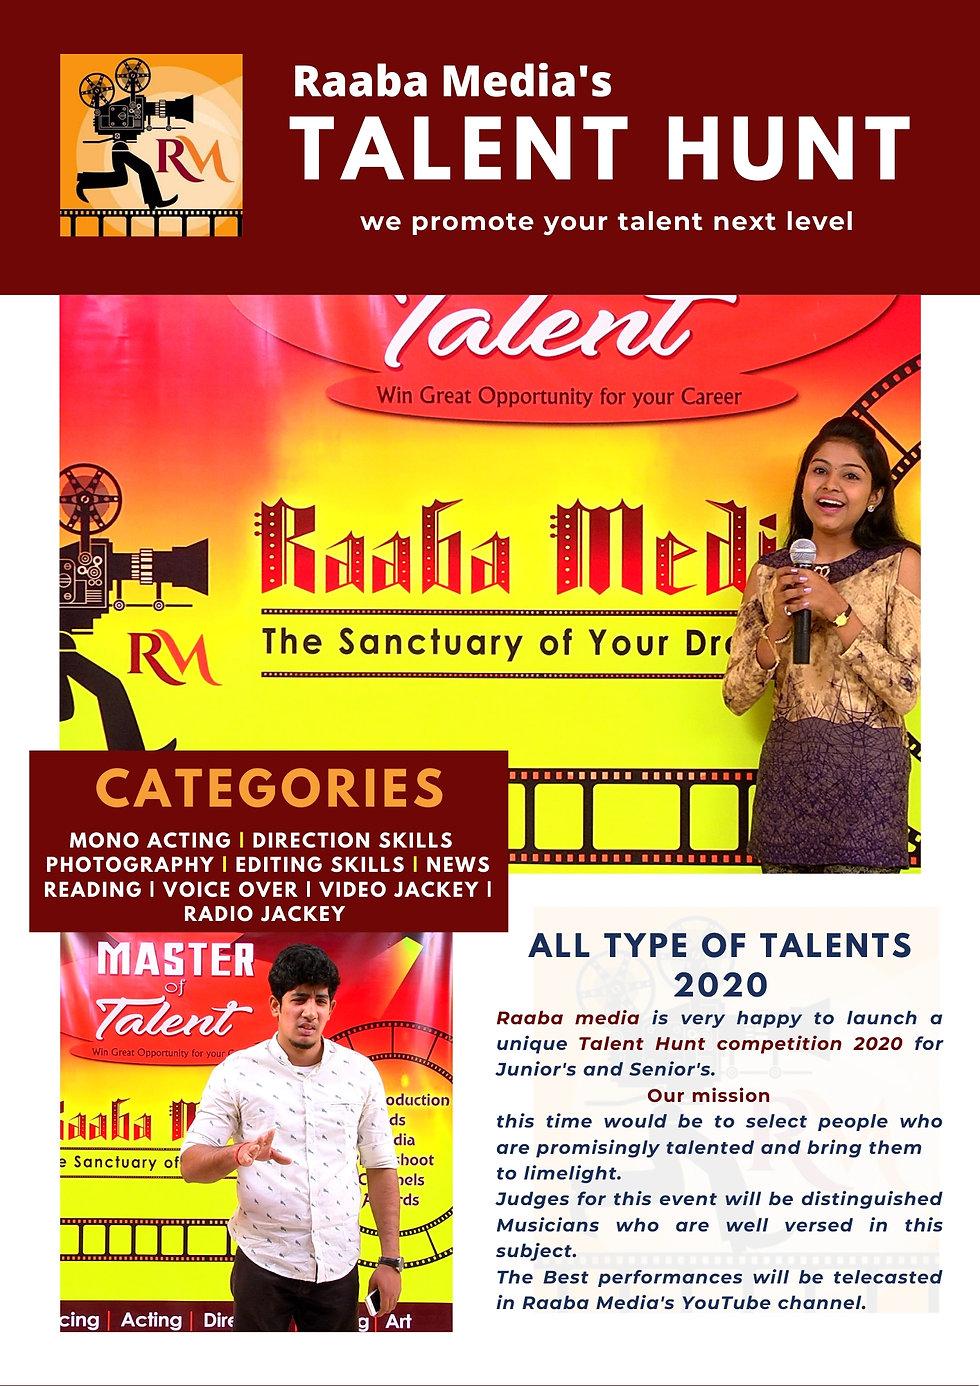 raabamedia's talent hunt film 01.jpg